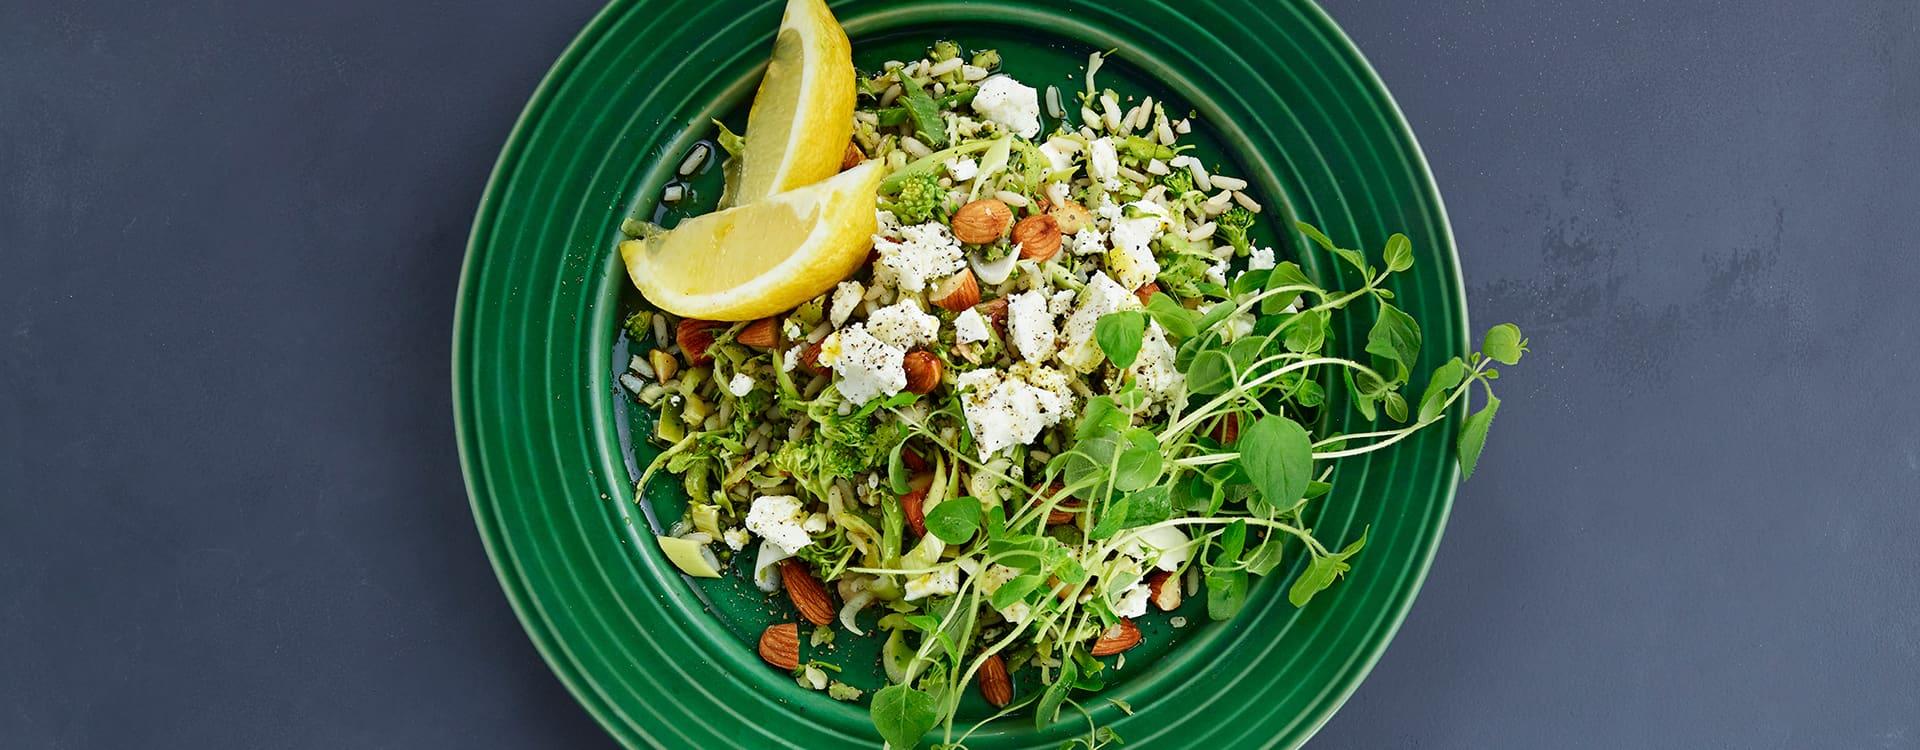 Rissalat med brokkoli, fetaost og mandler